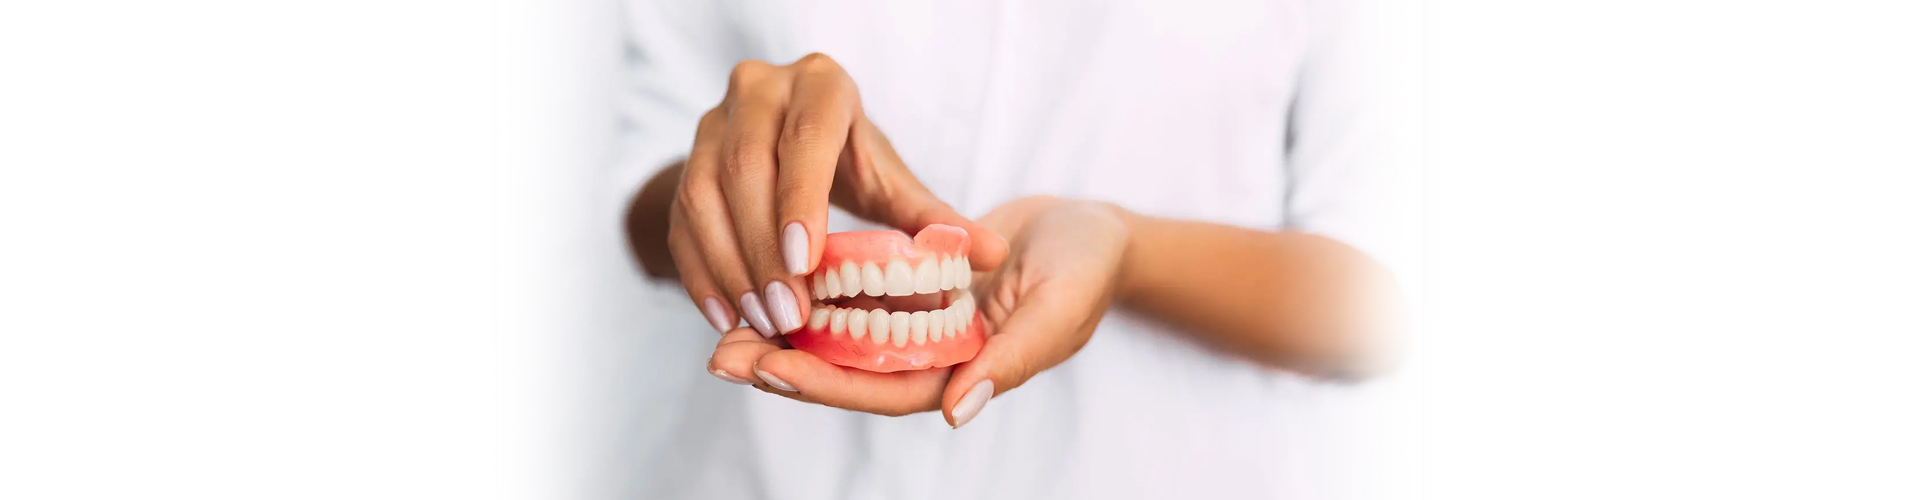 Partials and Dentures